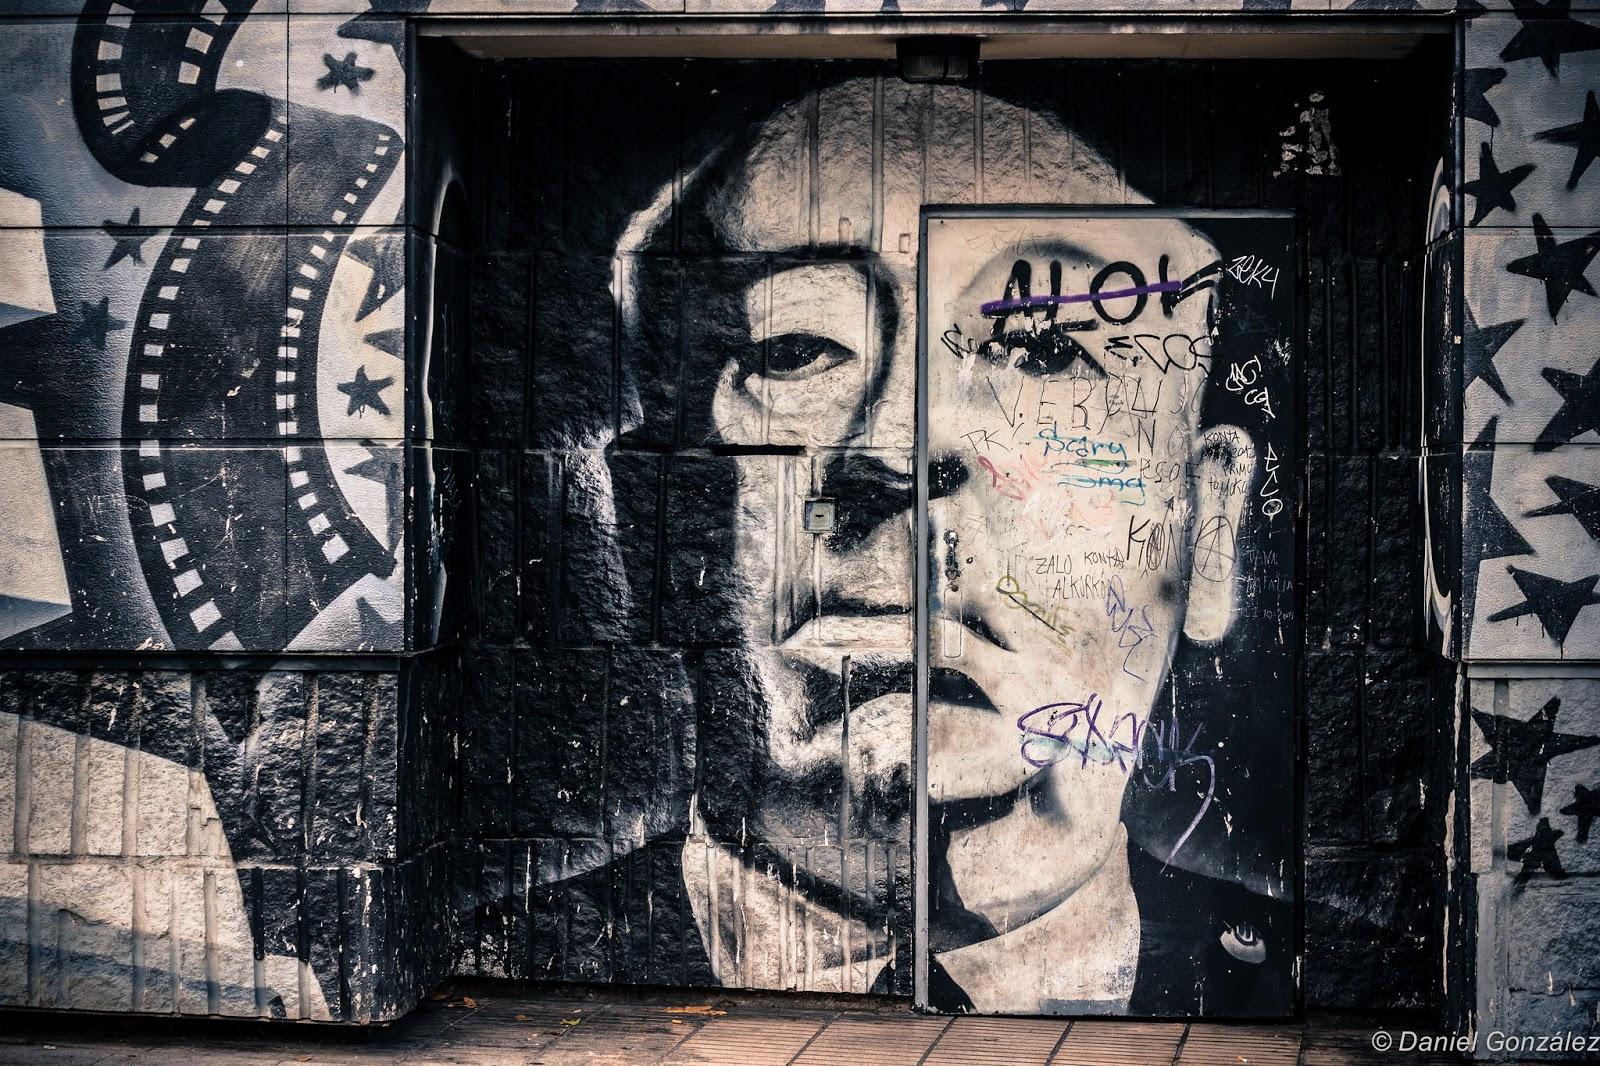 Alfred Hitchcock Graffiti, Alcorcón 2012